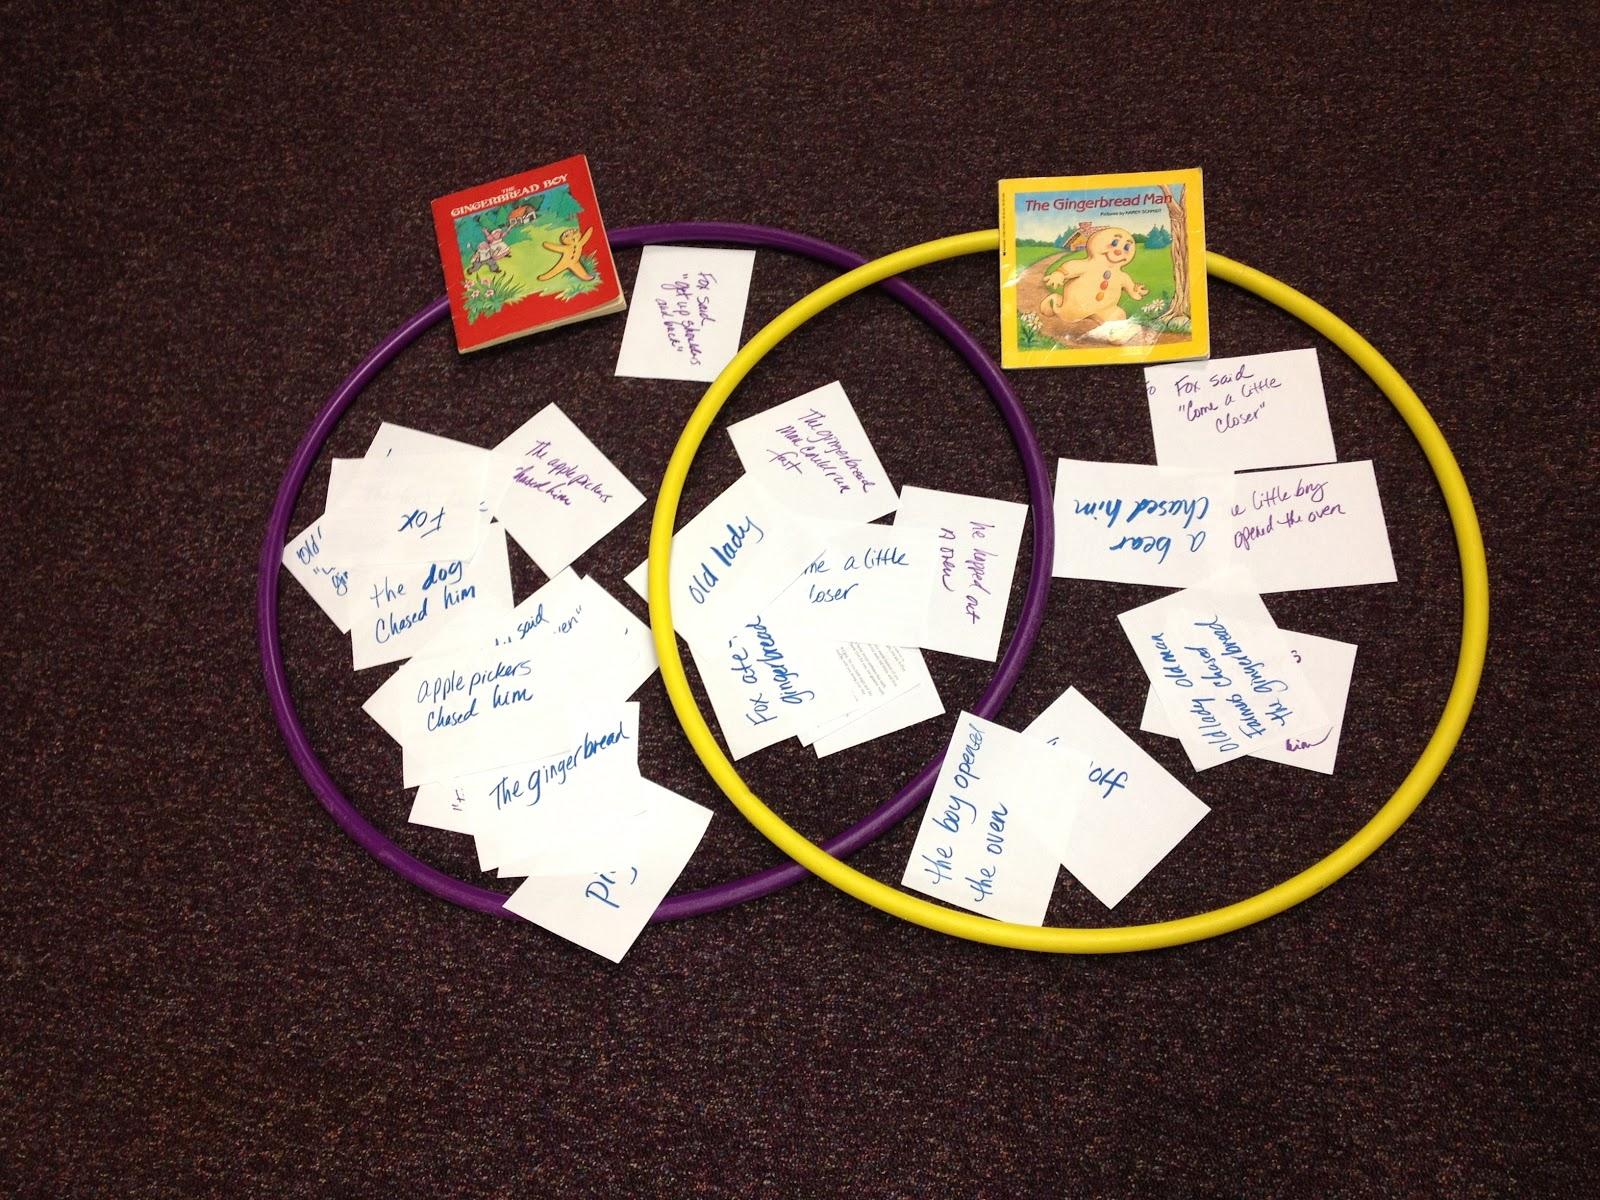 gingerbread venn diagram yamaha golf cart wiring gas kindergarten tales the man